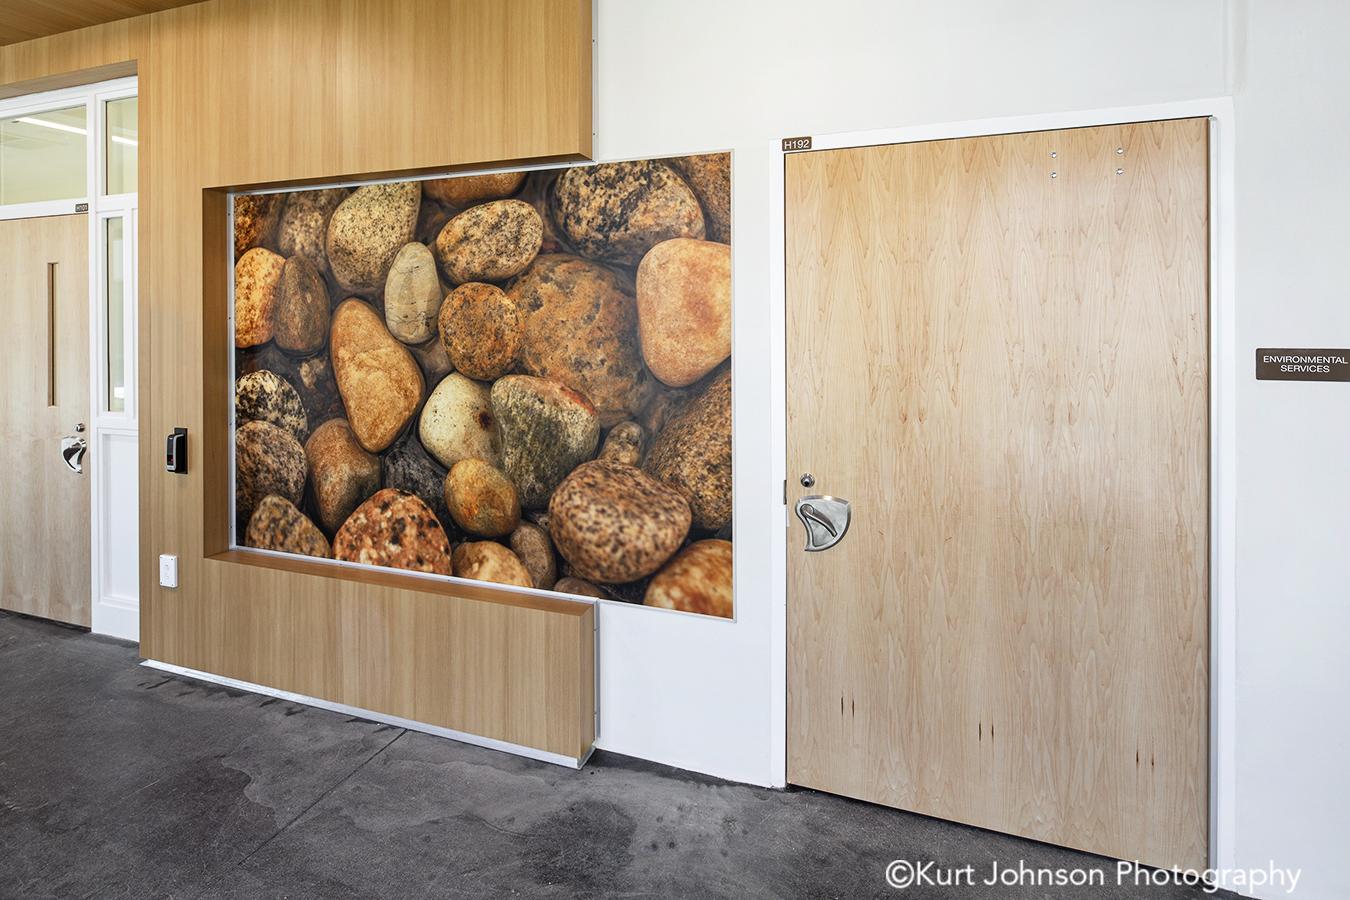 fulton state hospital missouri mo behavioral health Koroseal fusion wall protection stones rocks nature corridor hallway wayfinding art install installation